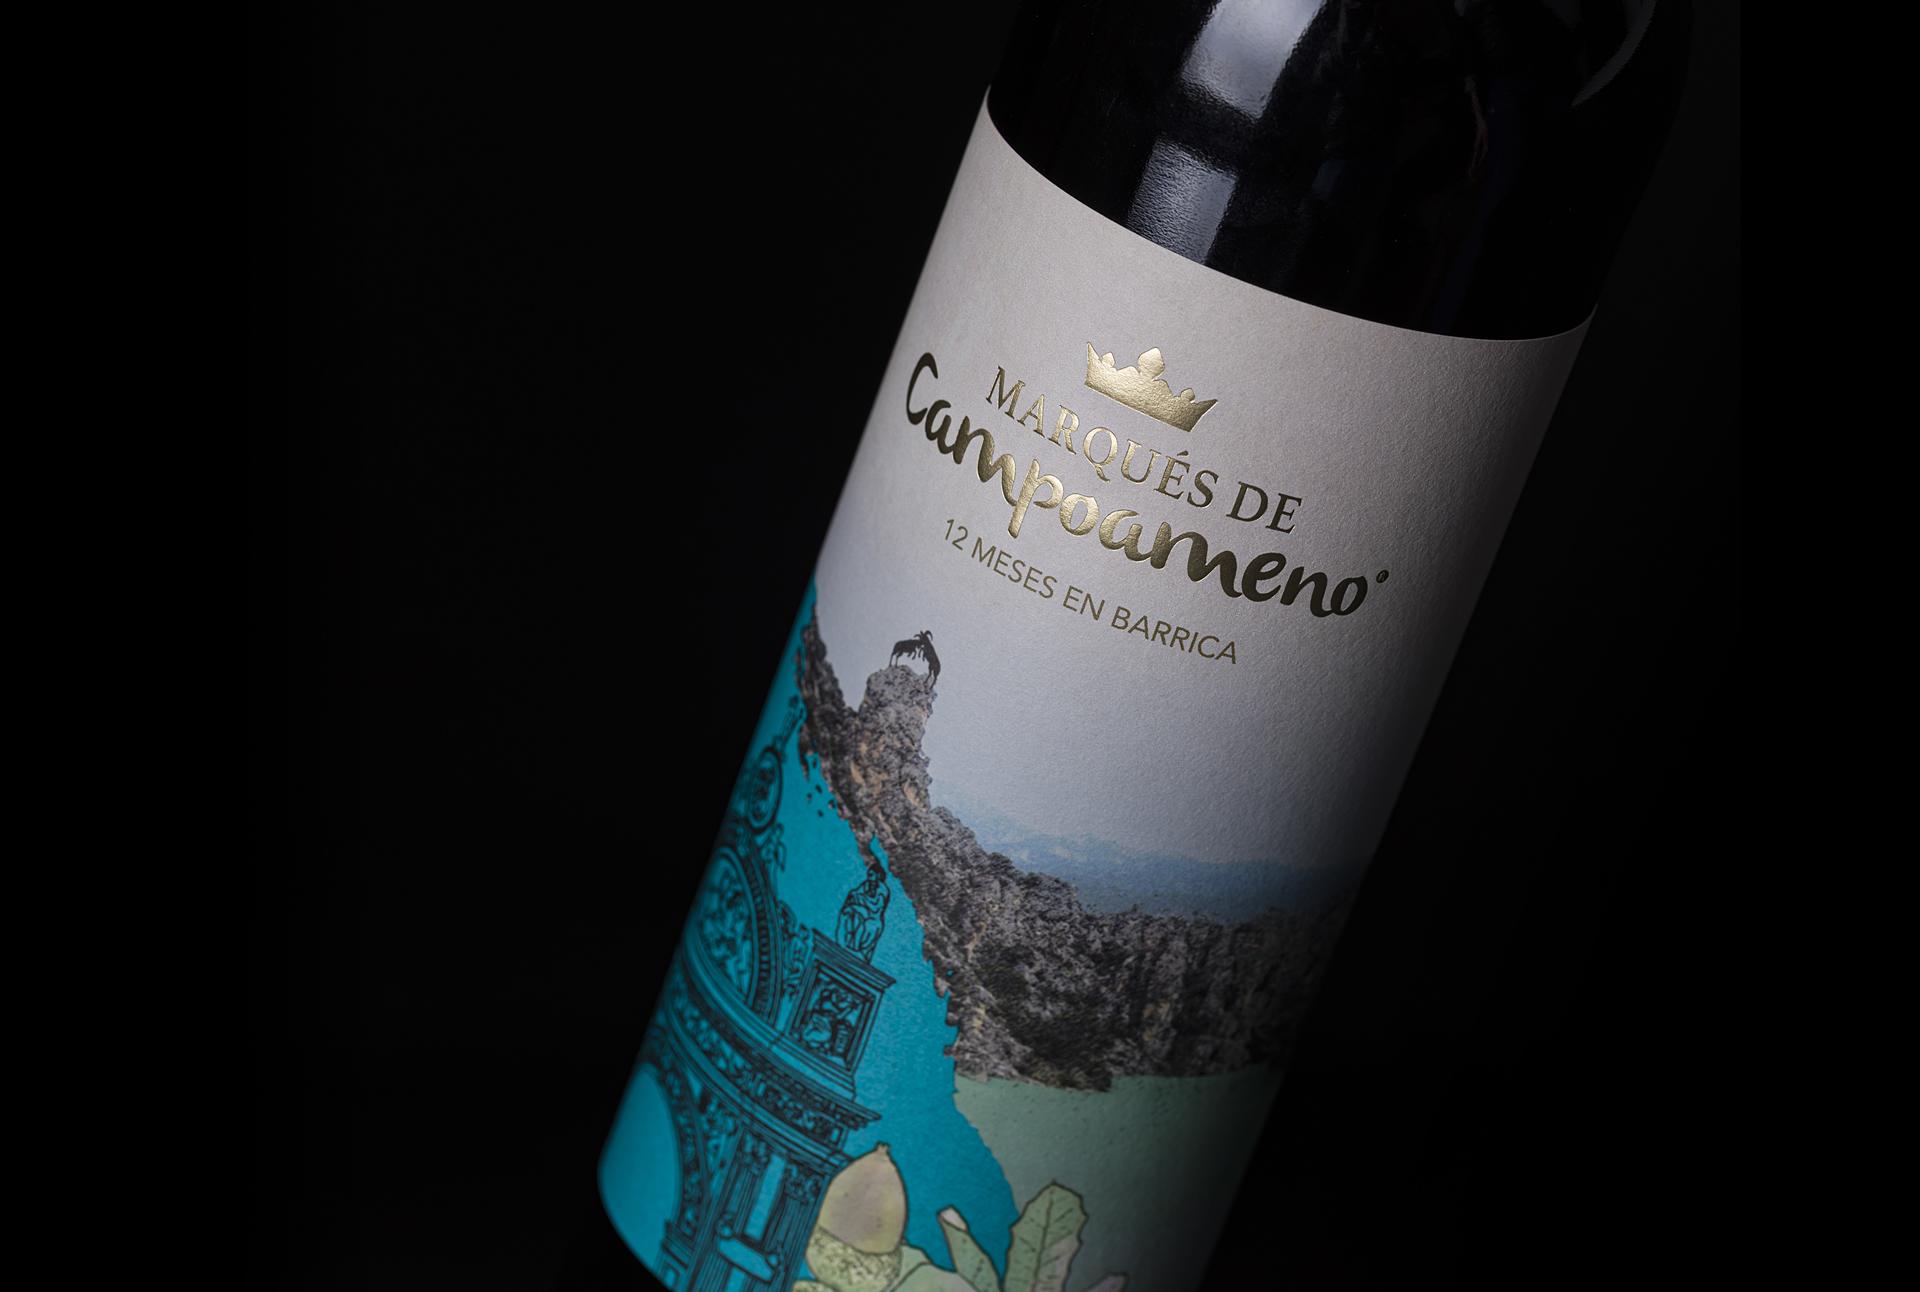 """Campoameno"" Wine – A Tribute to Jaén The Land Where Its Wines Are Born"